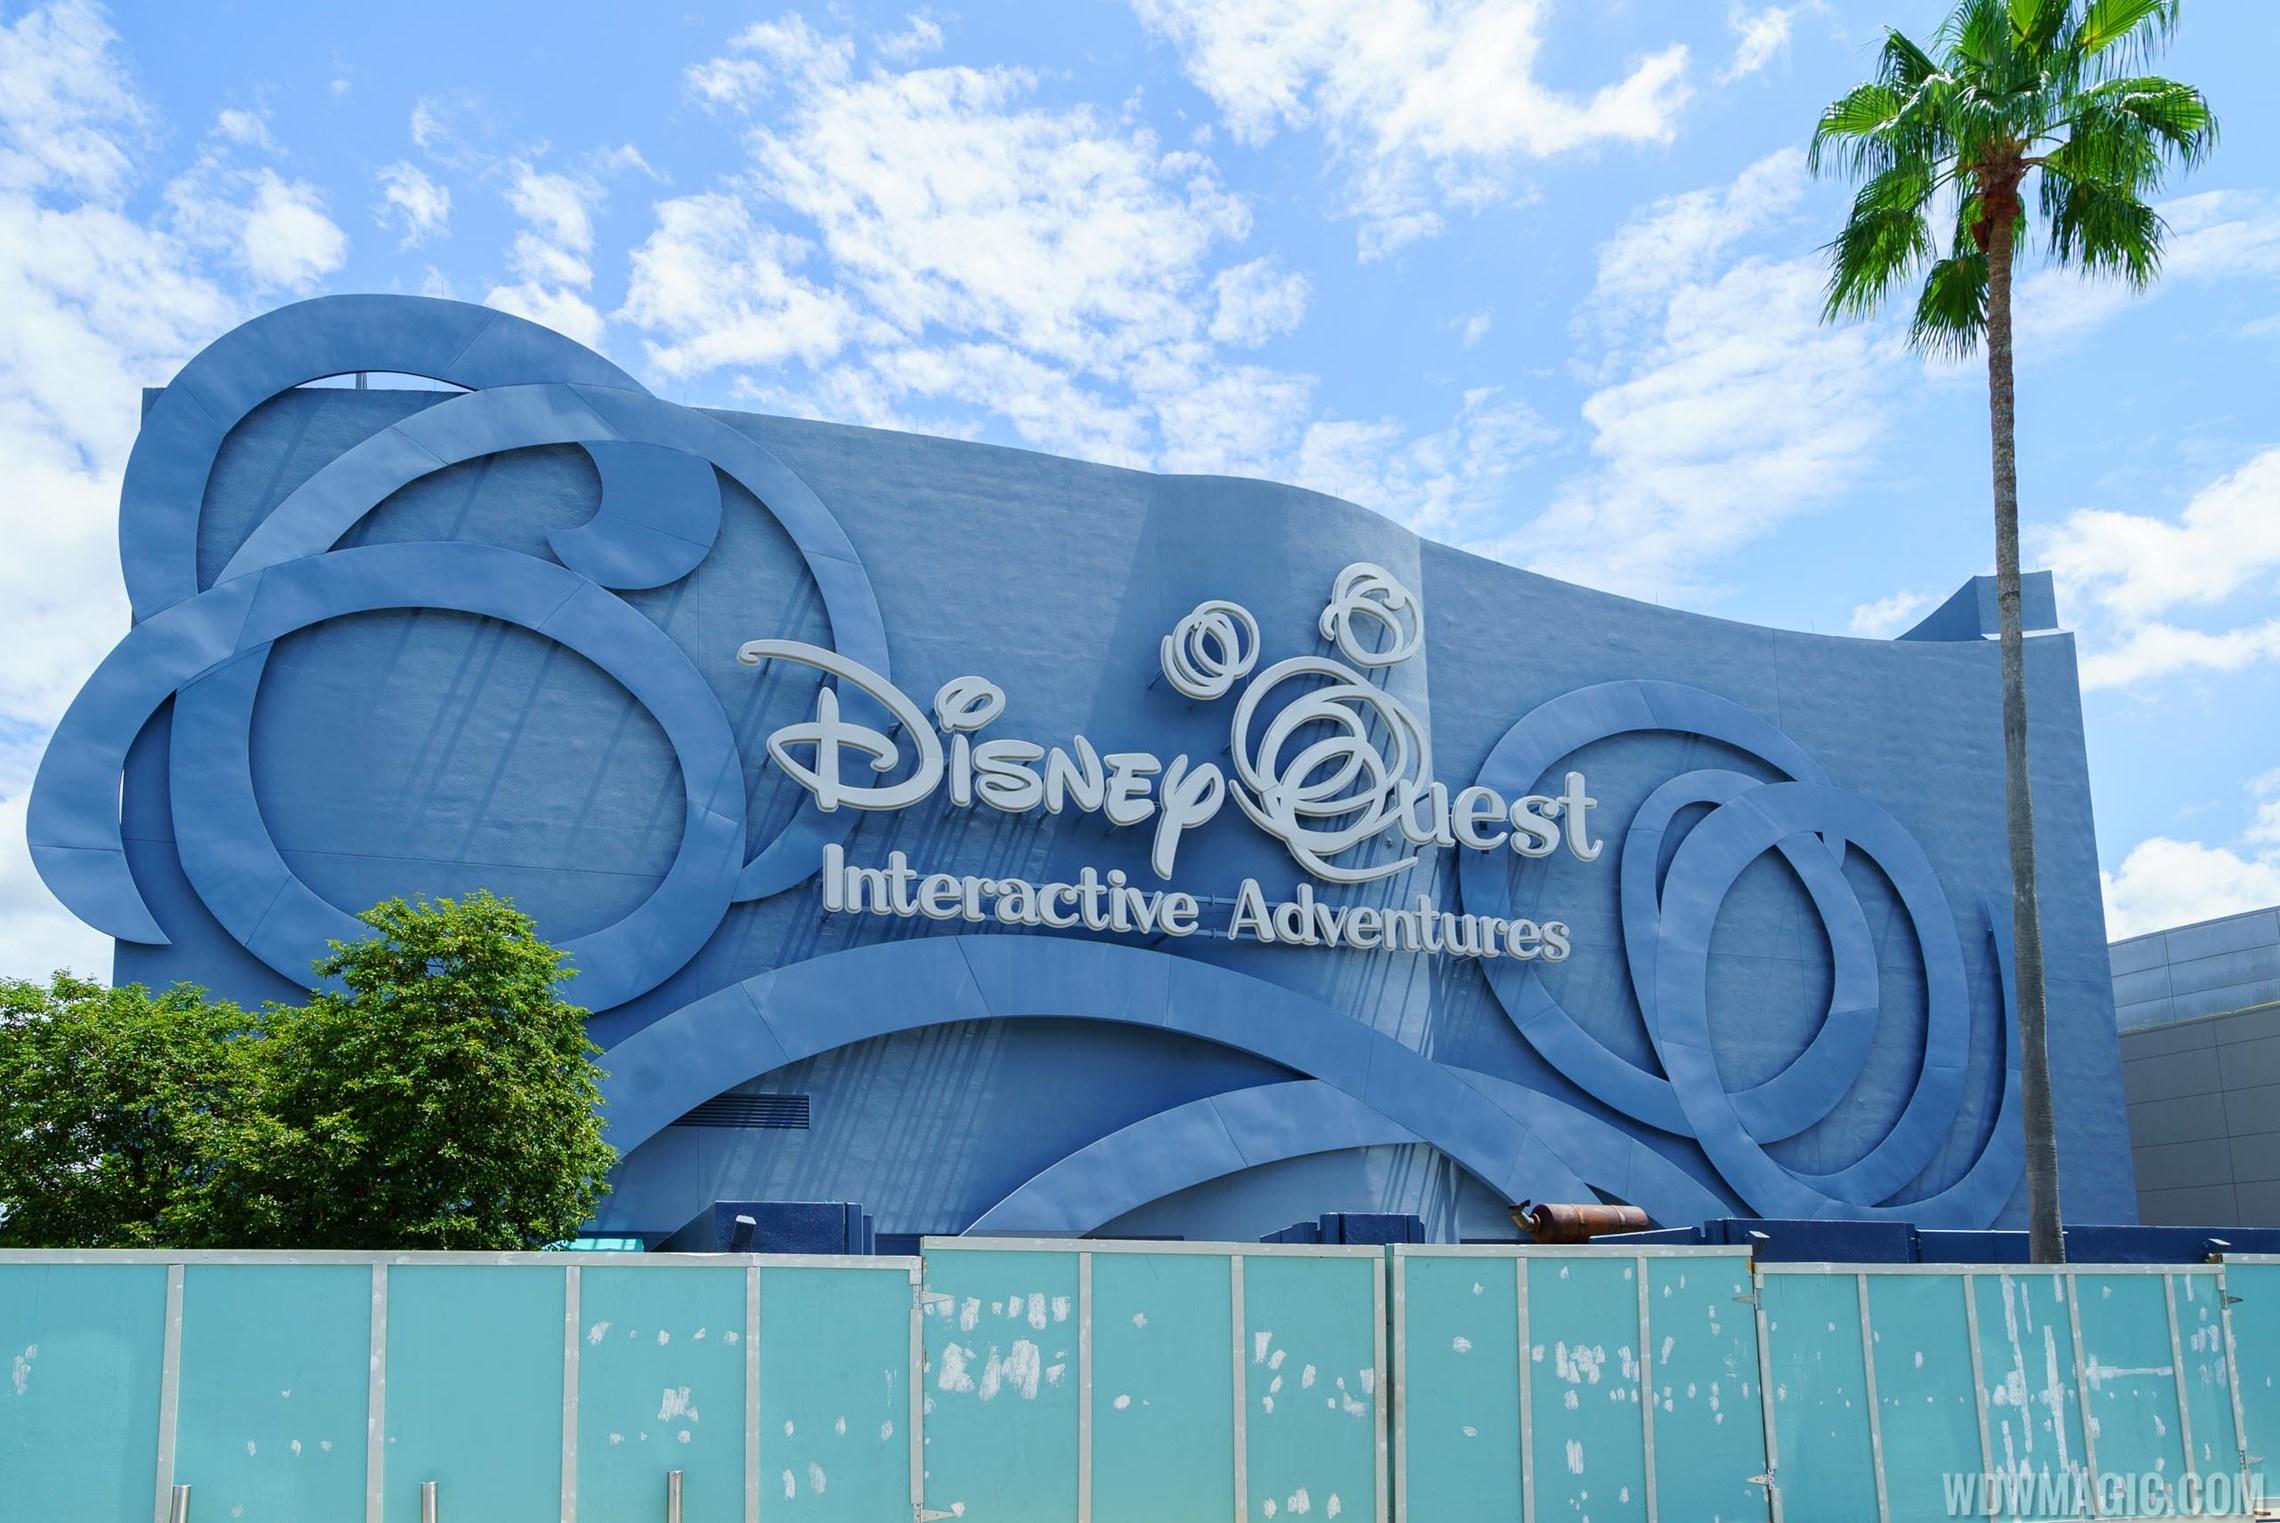 Walls around closed Disney Quest